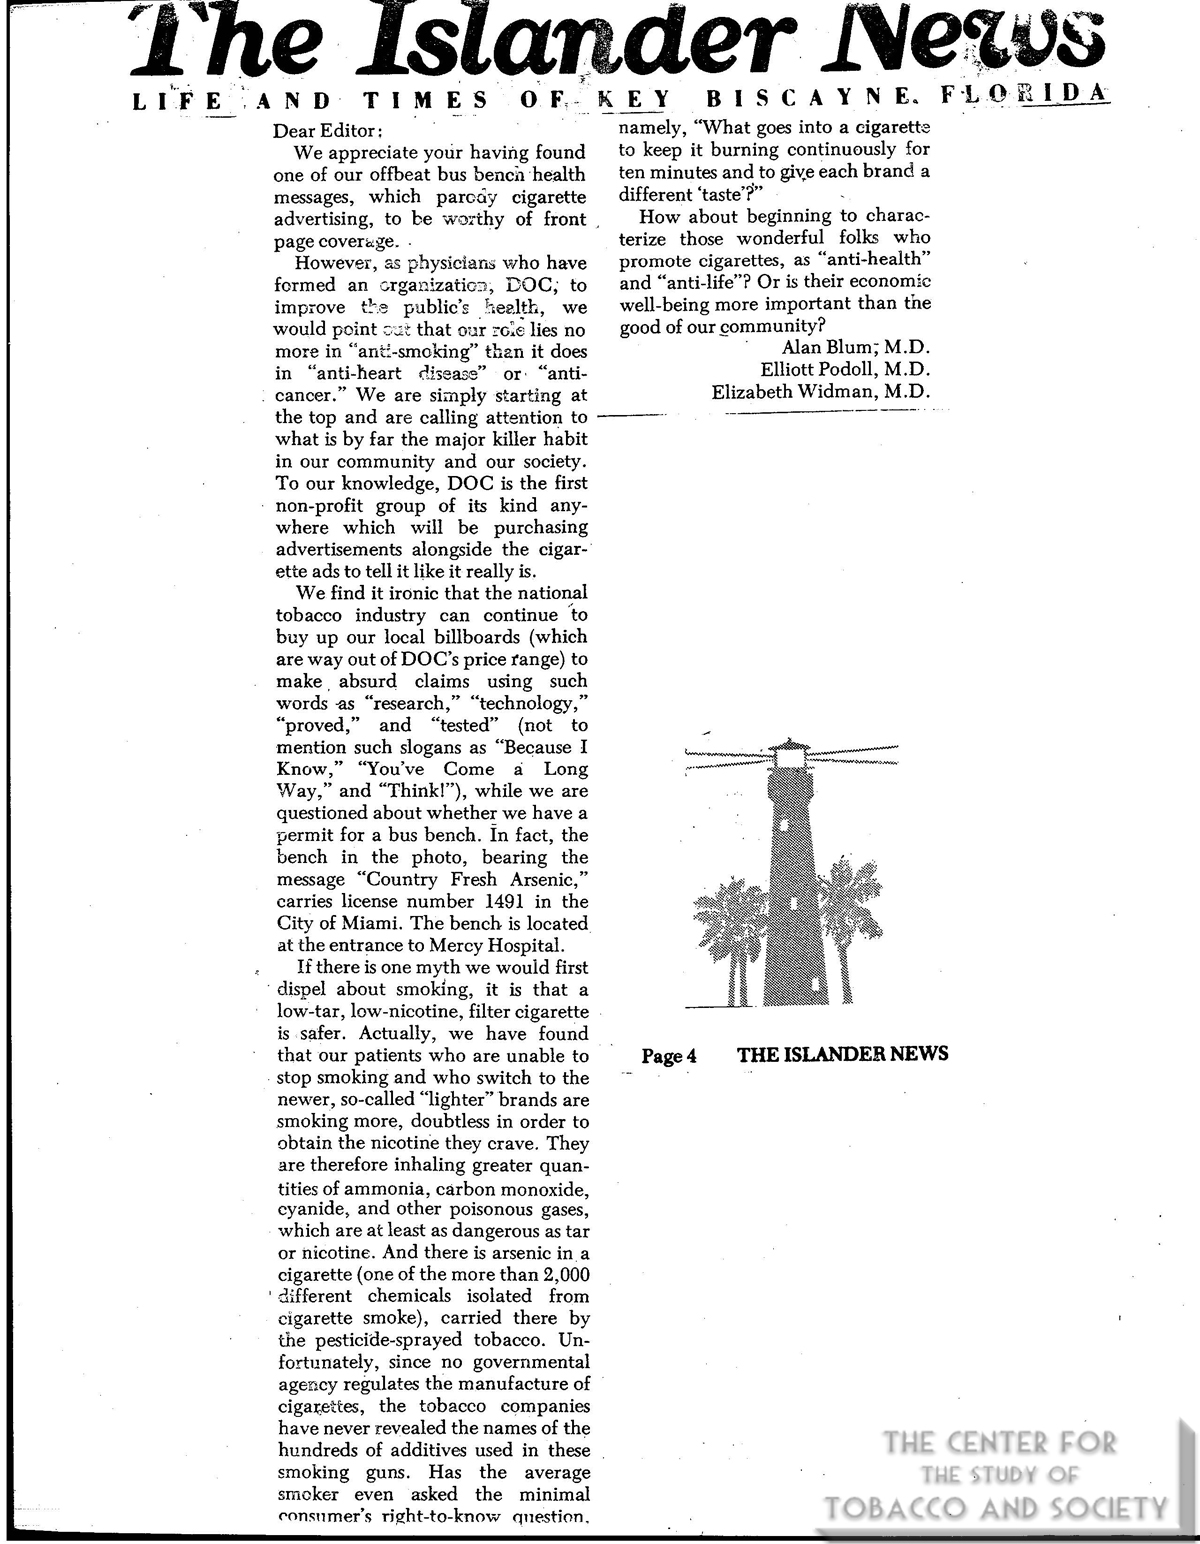 1978 Islander News Info on DOC